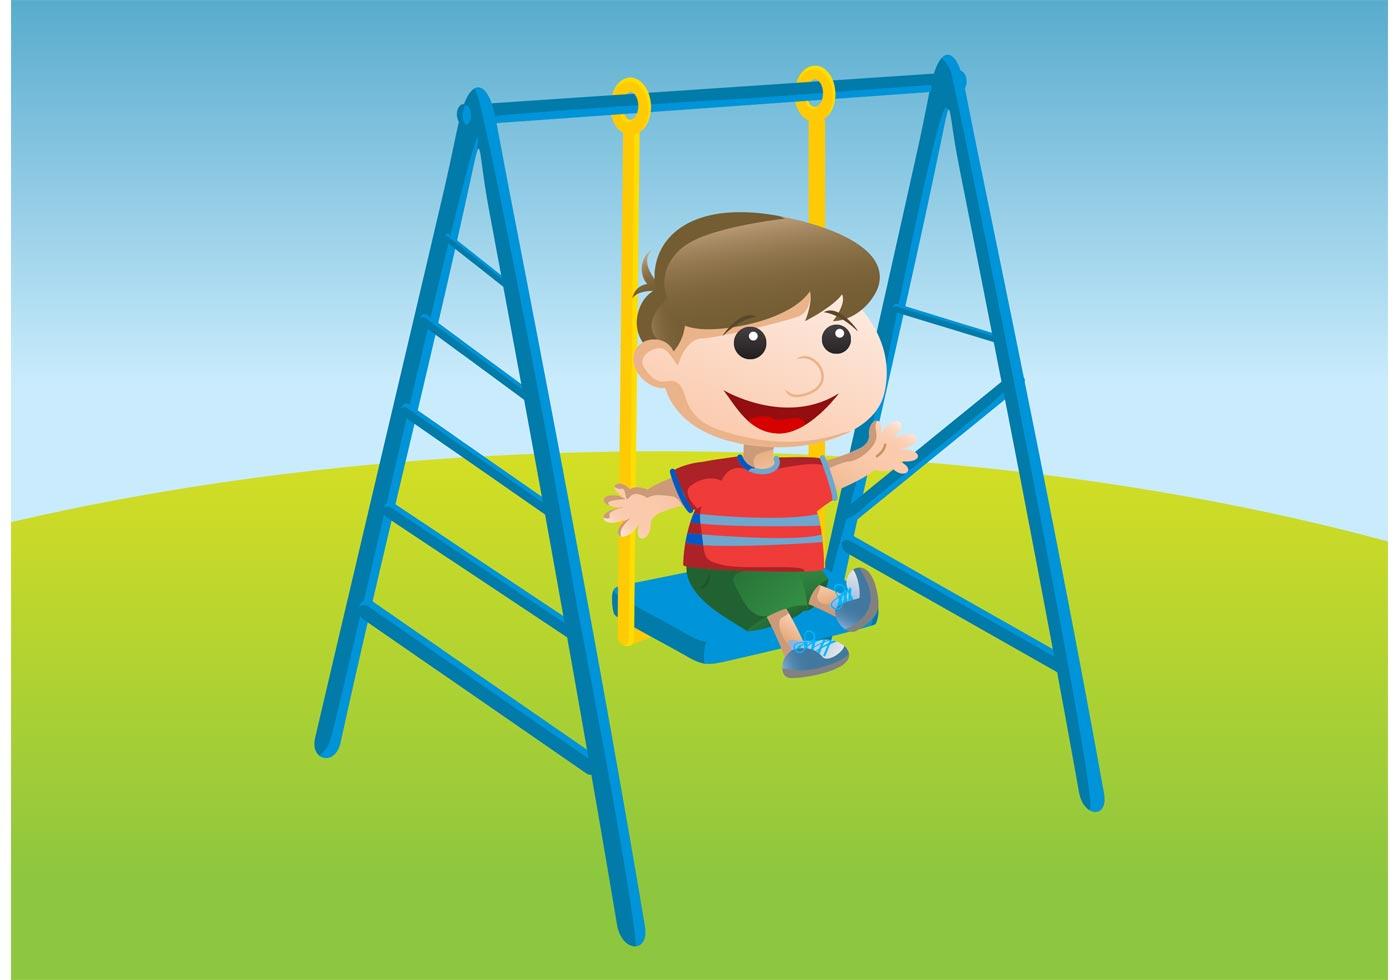 A Child Swings On A Playground Swing Schaukel Gifs Bilder